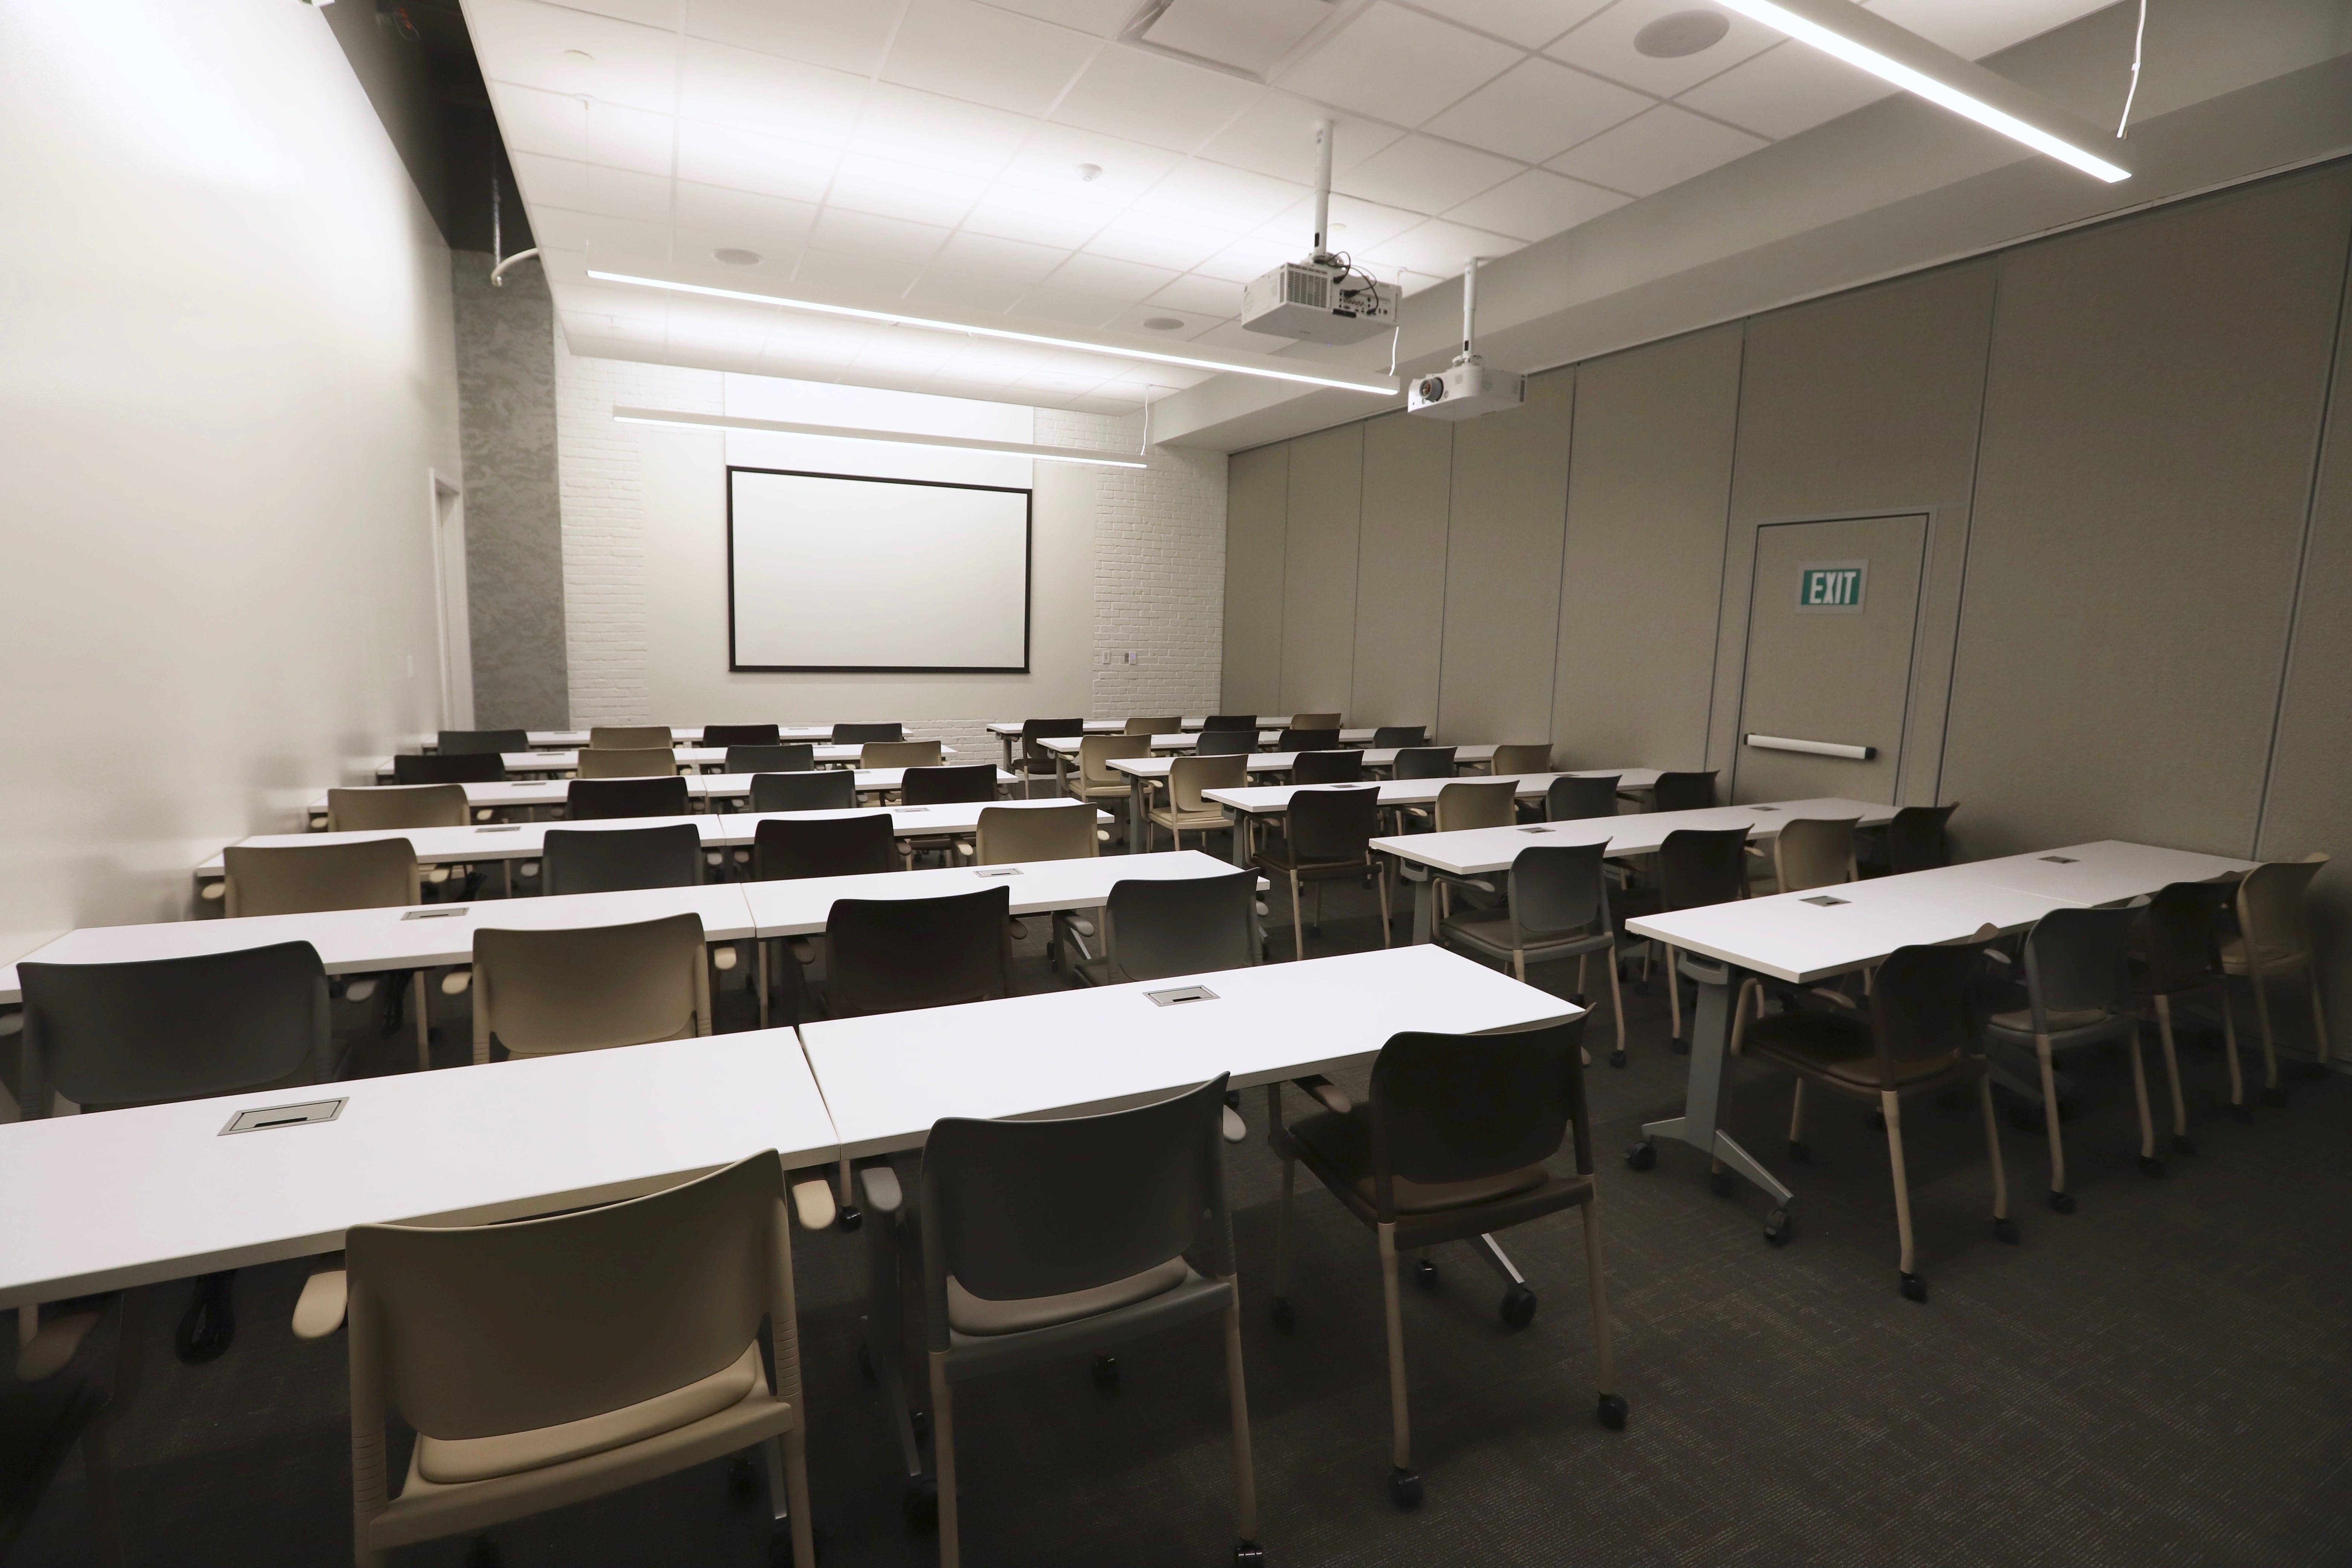 Forum Training Room Seating 70 People At Roam Perimeter